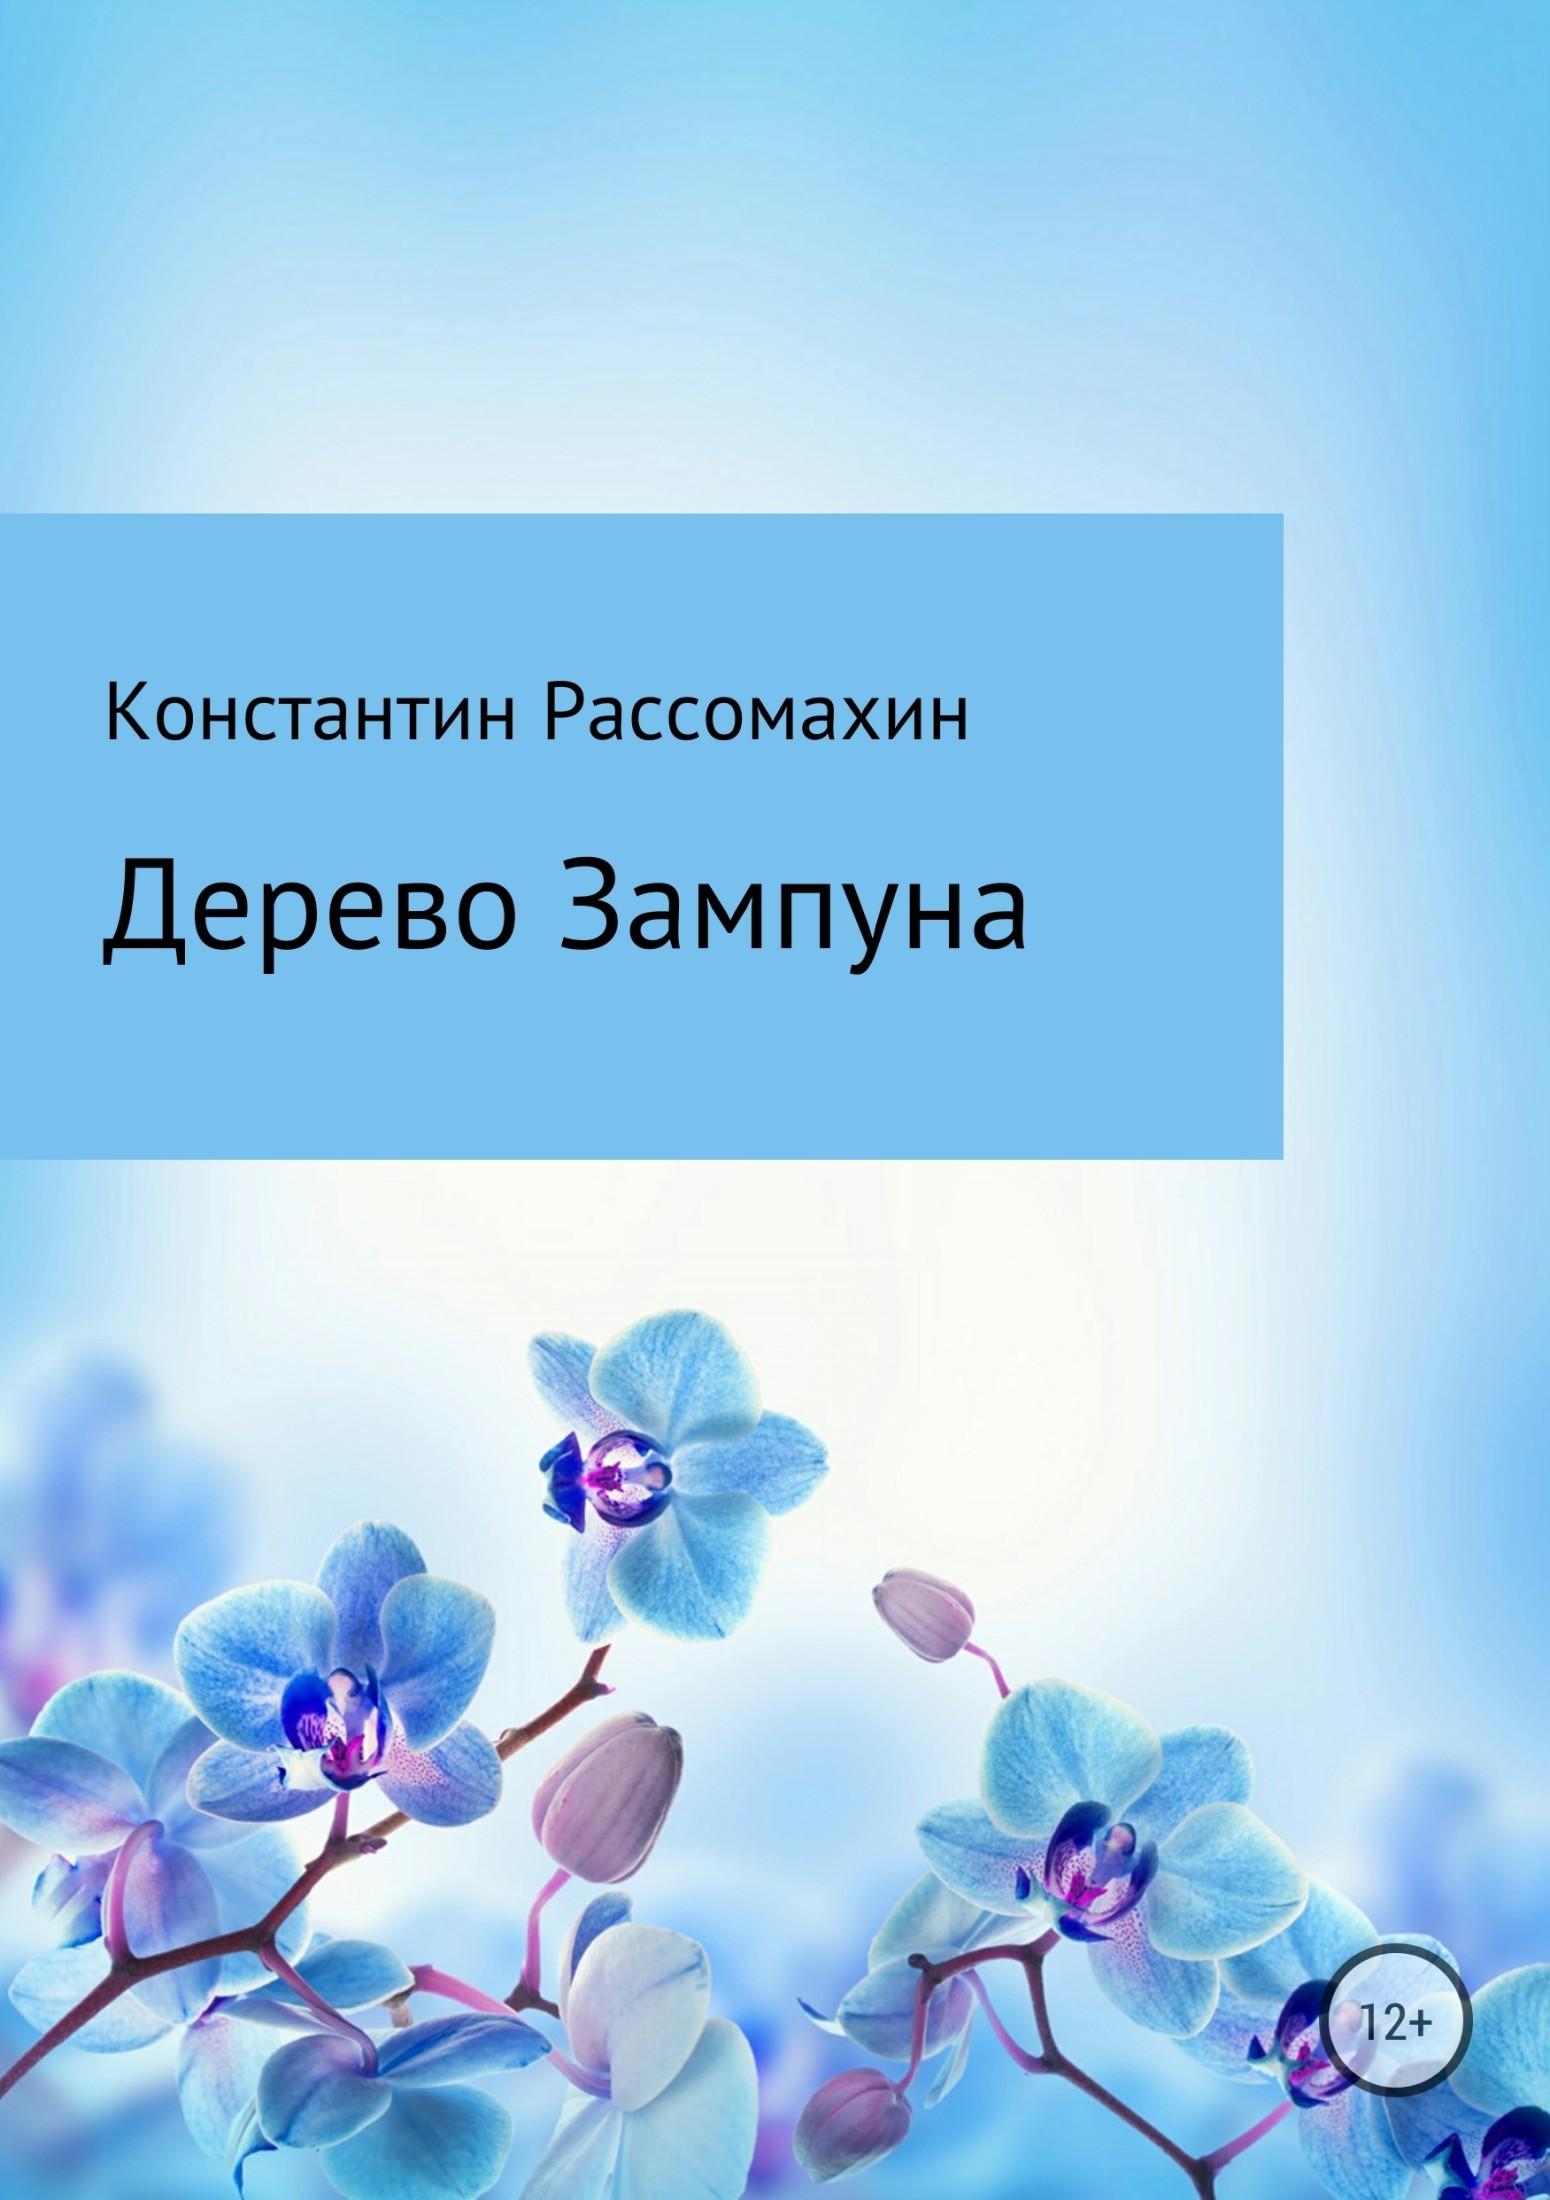 Константин Рассомахин Дерево Зампуна джаз в аптекарском огороде